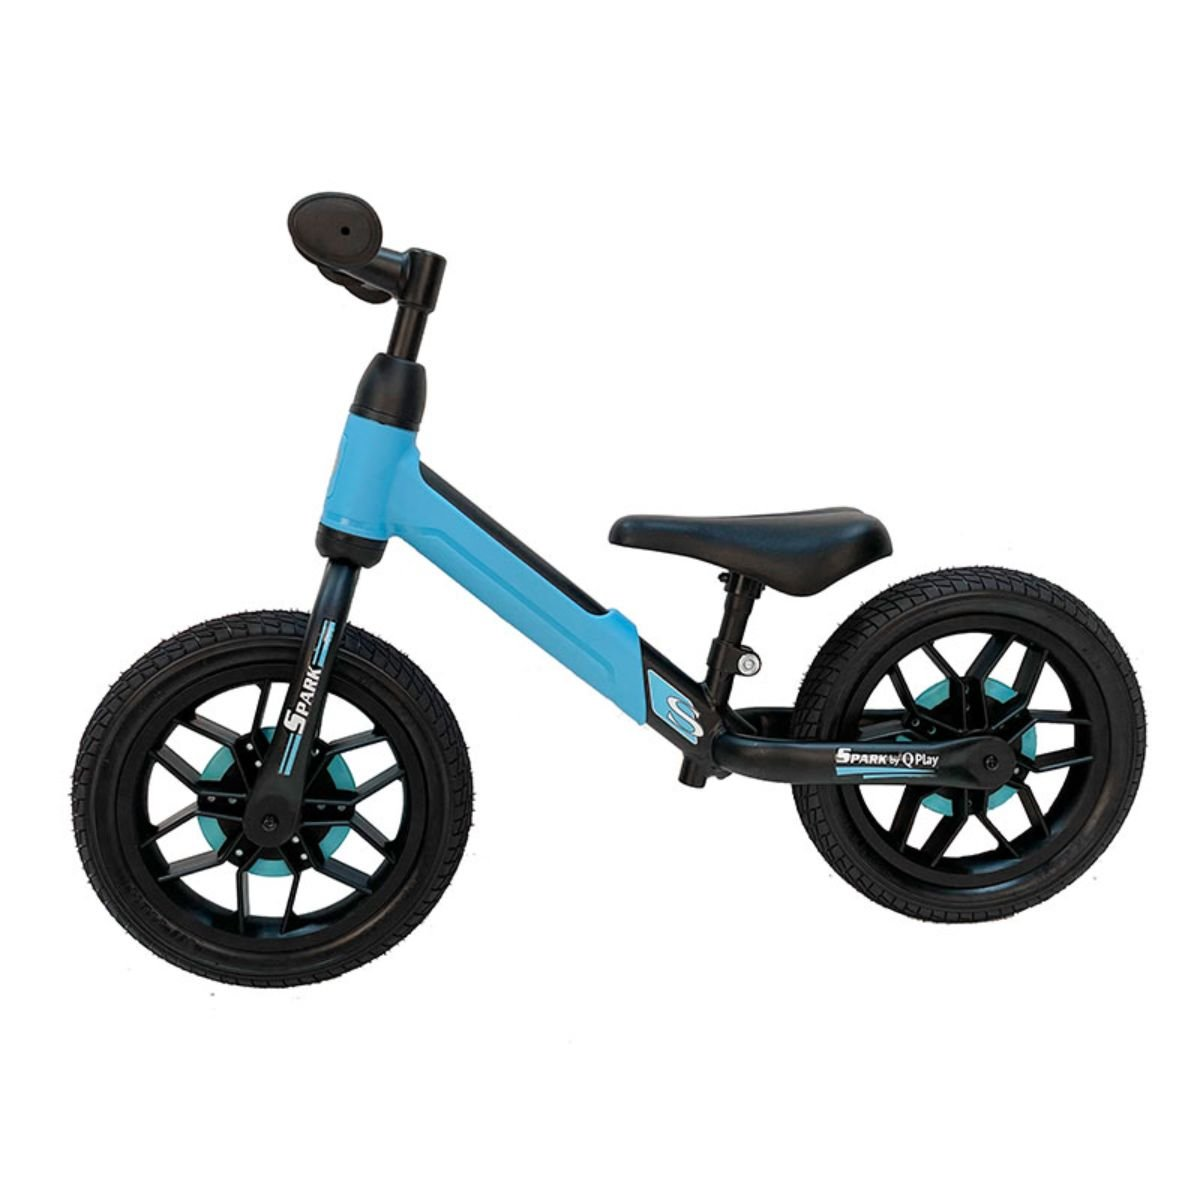 Bicicleta fara pedale DHS Baby Qplay Spark, Albastru, 12 inch